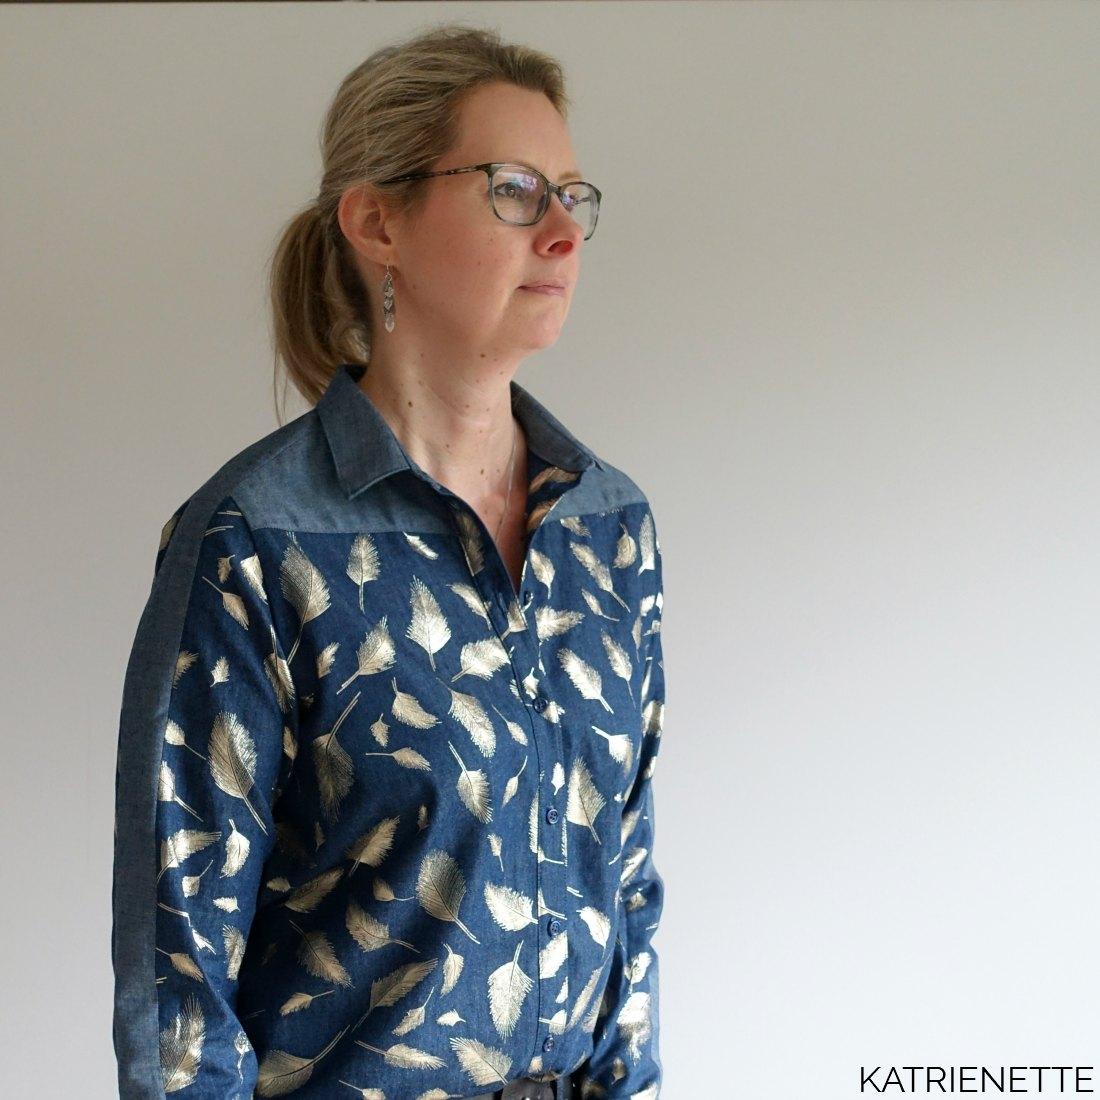 katrienette wenona shirt blouse named namedclothing clothing chambray dames tweekleurig twee kleuren two colors jeans feathers veertjes pluimen bling